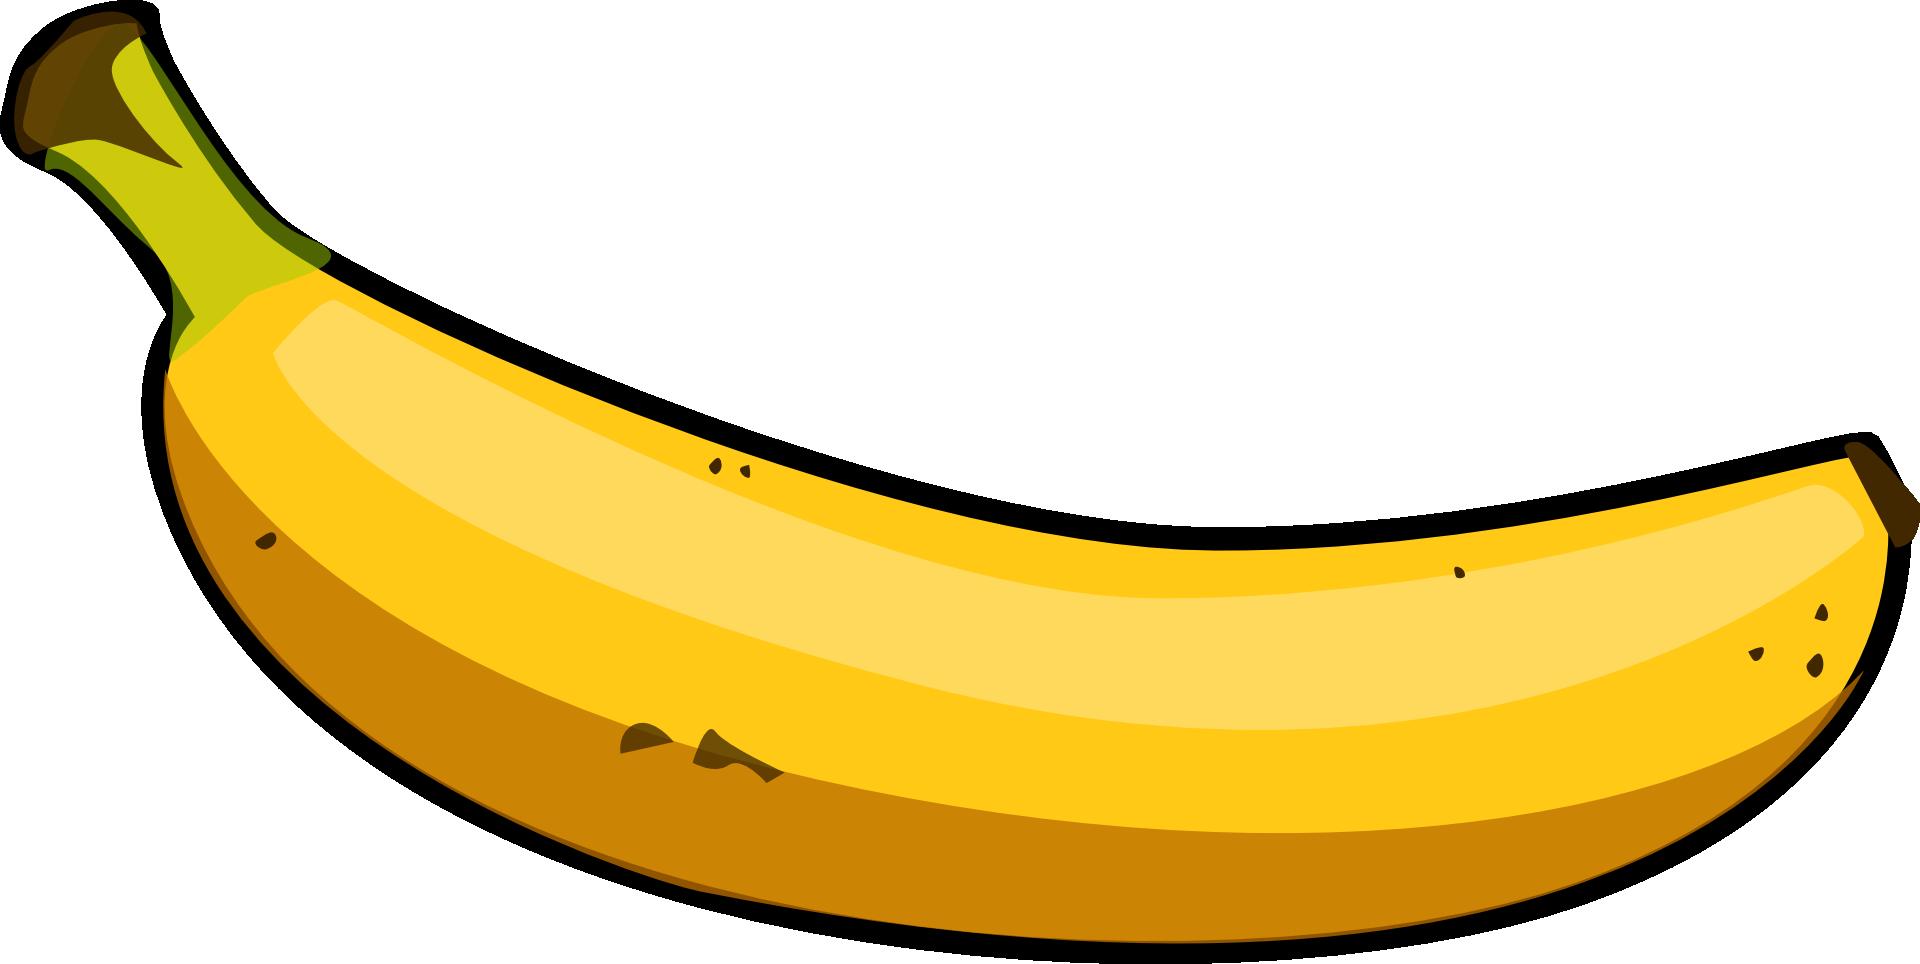 Bananas Clipart.